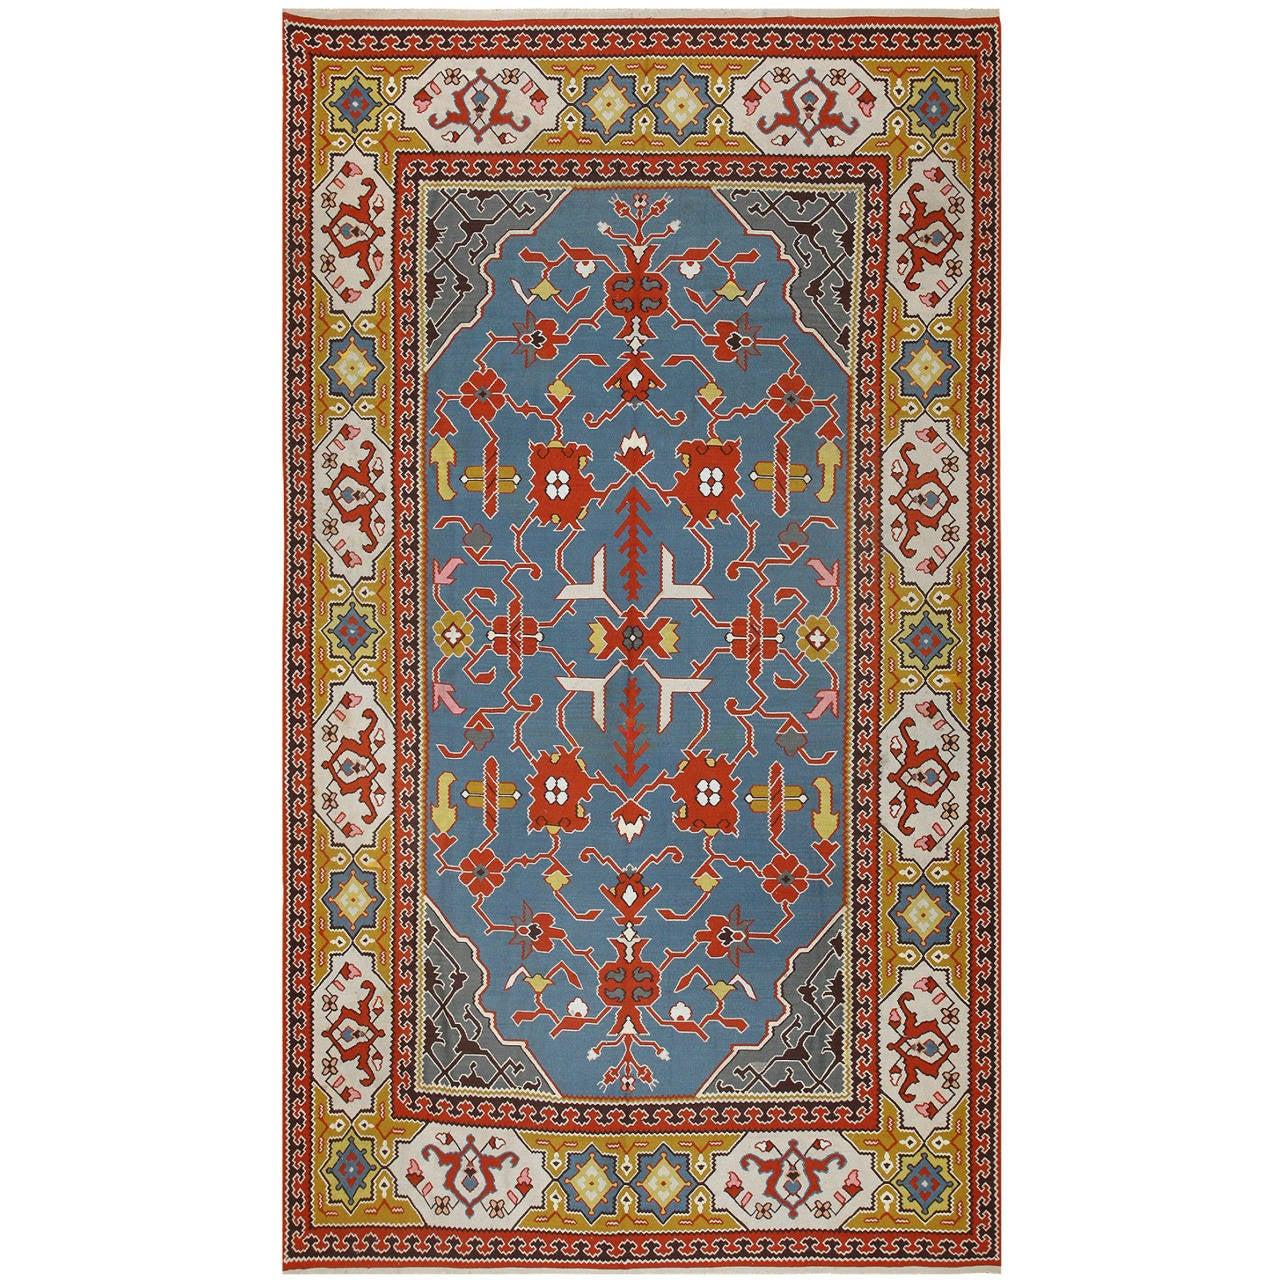 Vintage Turkish Kilim For Sale At 1stdibs